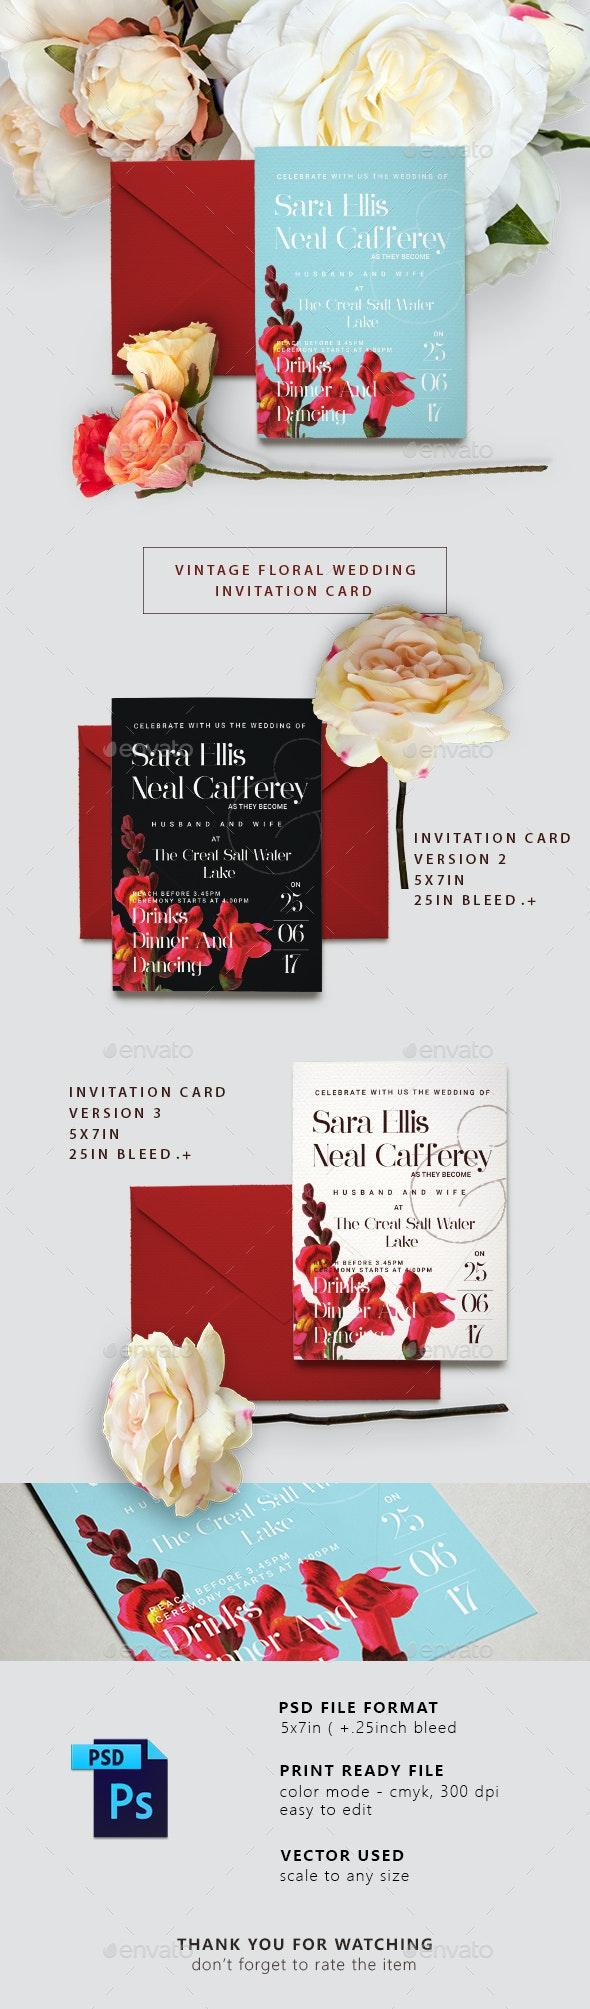 Vintage Floral Wedding Invitation Card - Weddings Cards & Invites